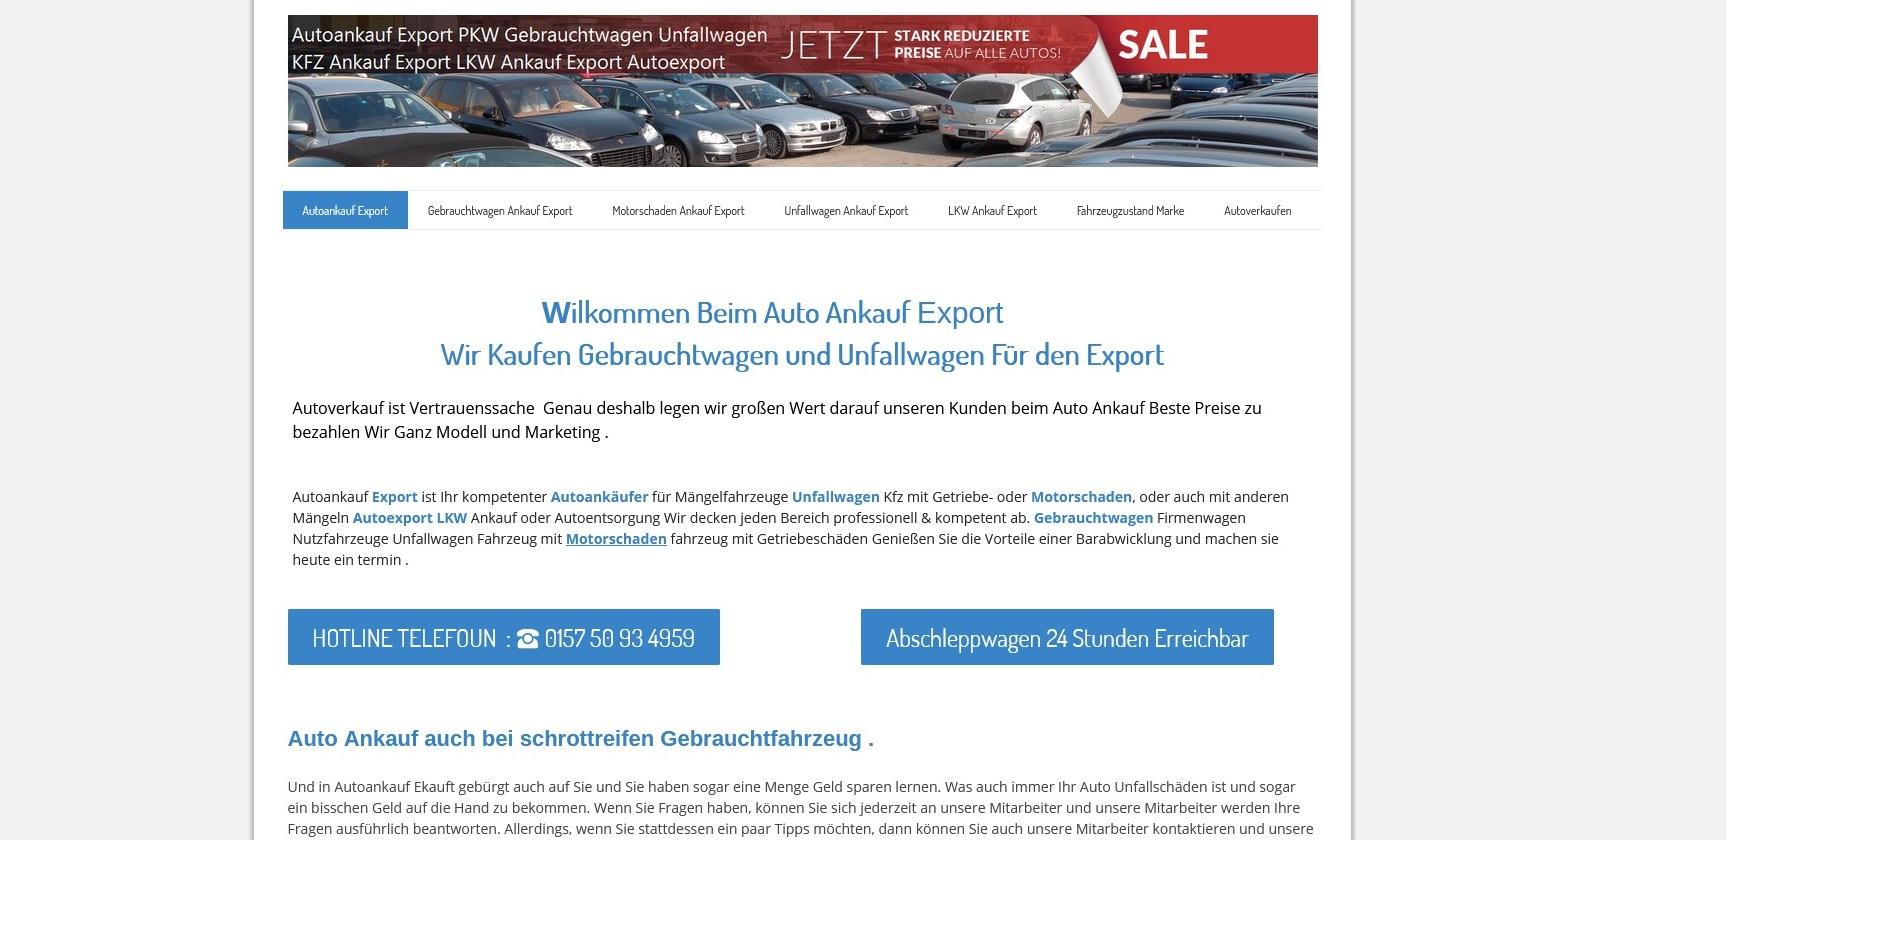 https://www.kfz-ankauf-export.de - Autoankauf Nordhorn